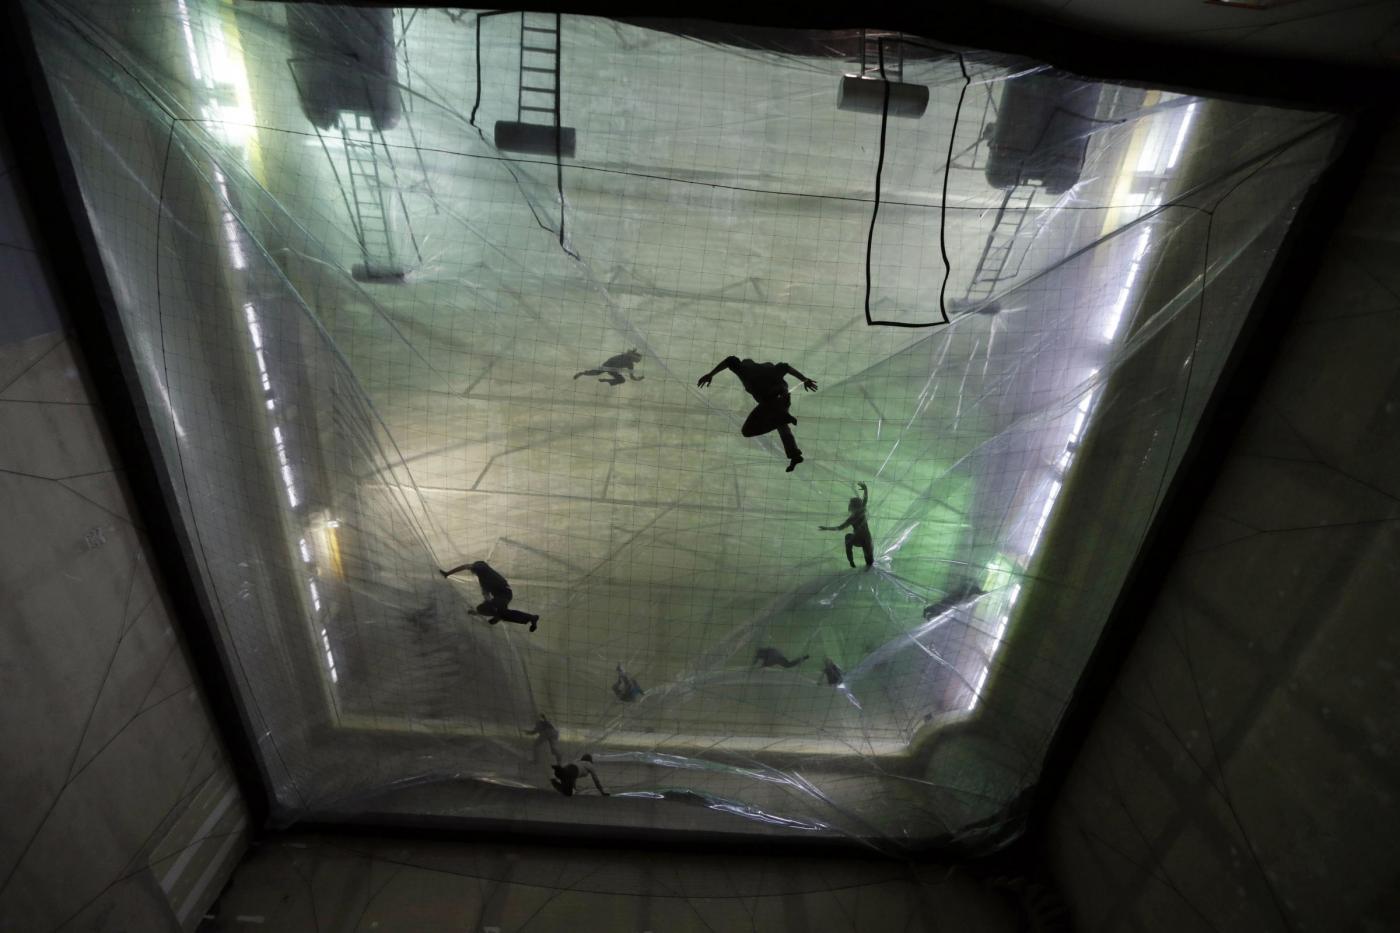 Milano, la bolla dell'artista argentino Tomás Saraceno02